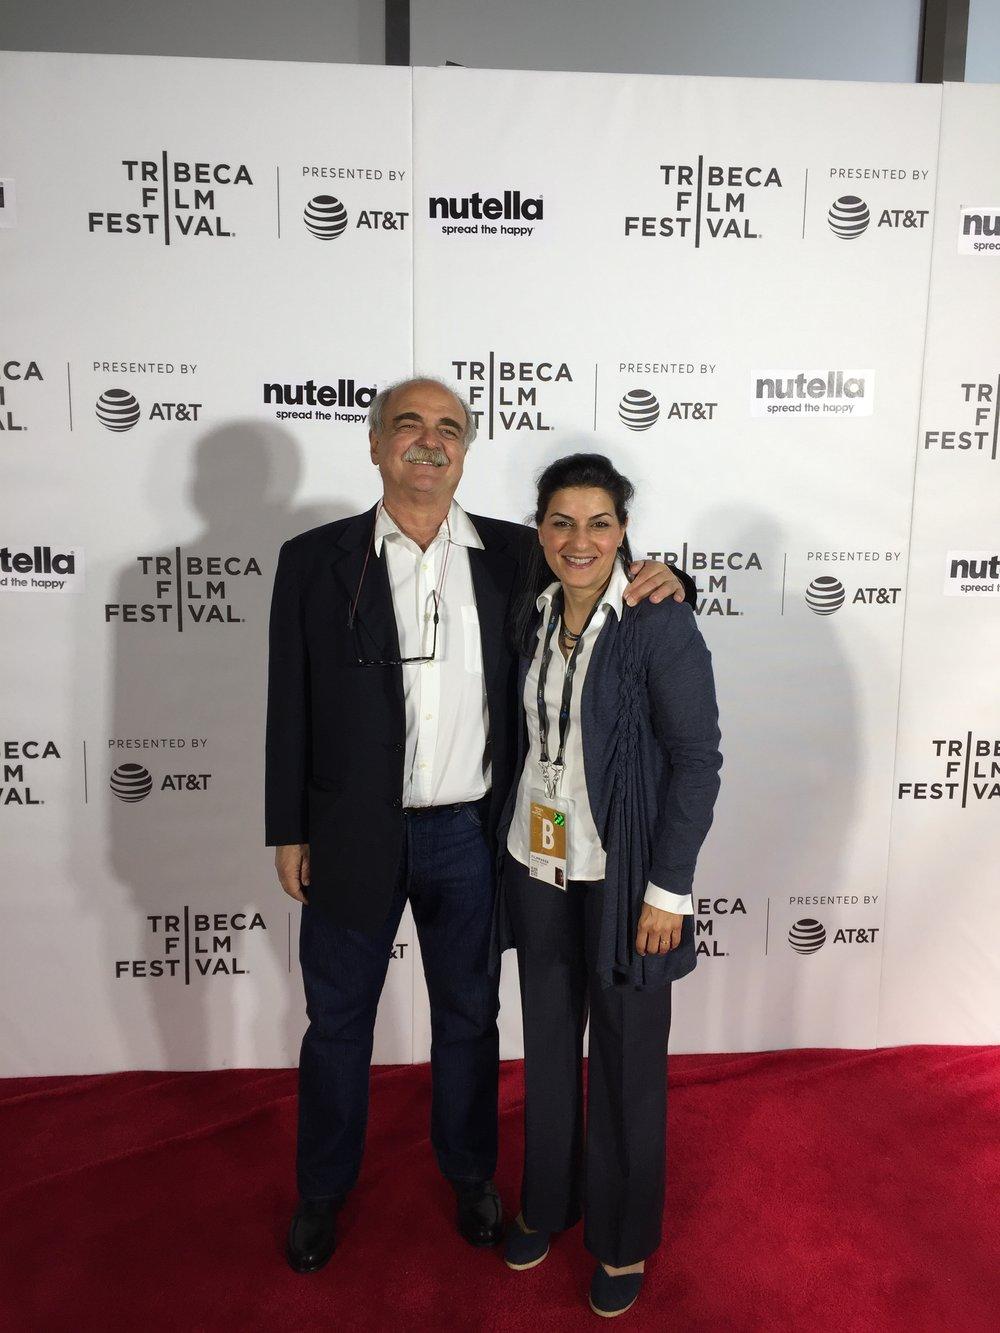 Franco Pagetti and Aeyliya Husain (Director/Producer)